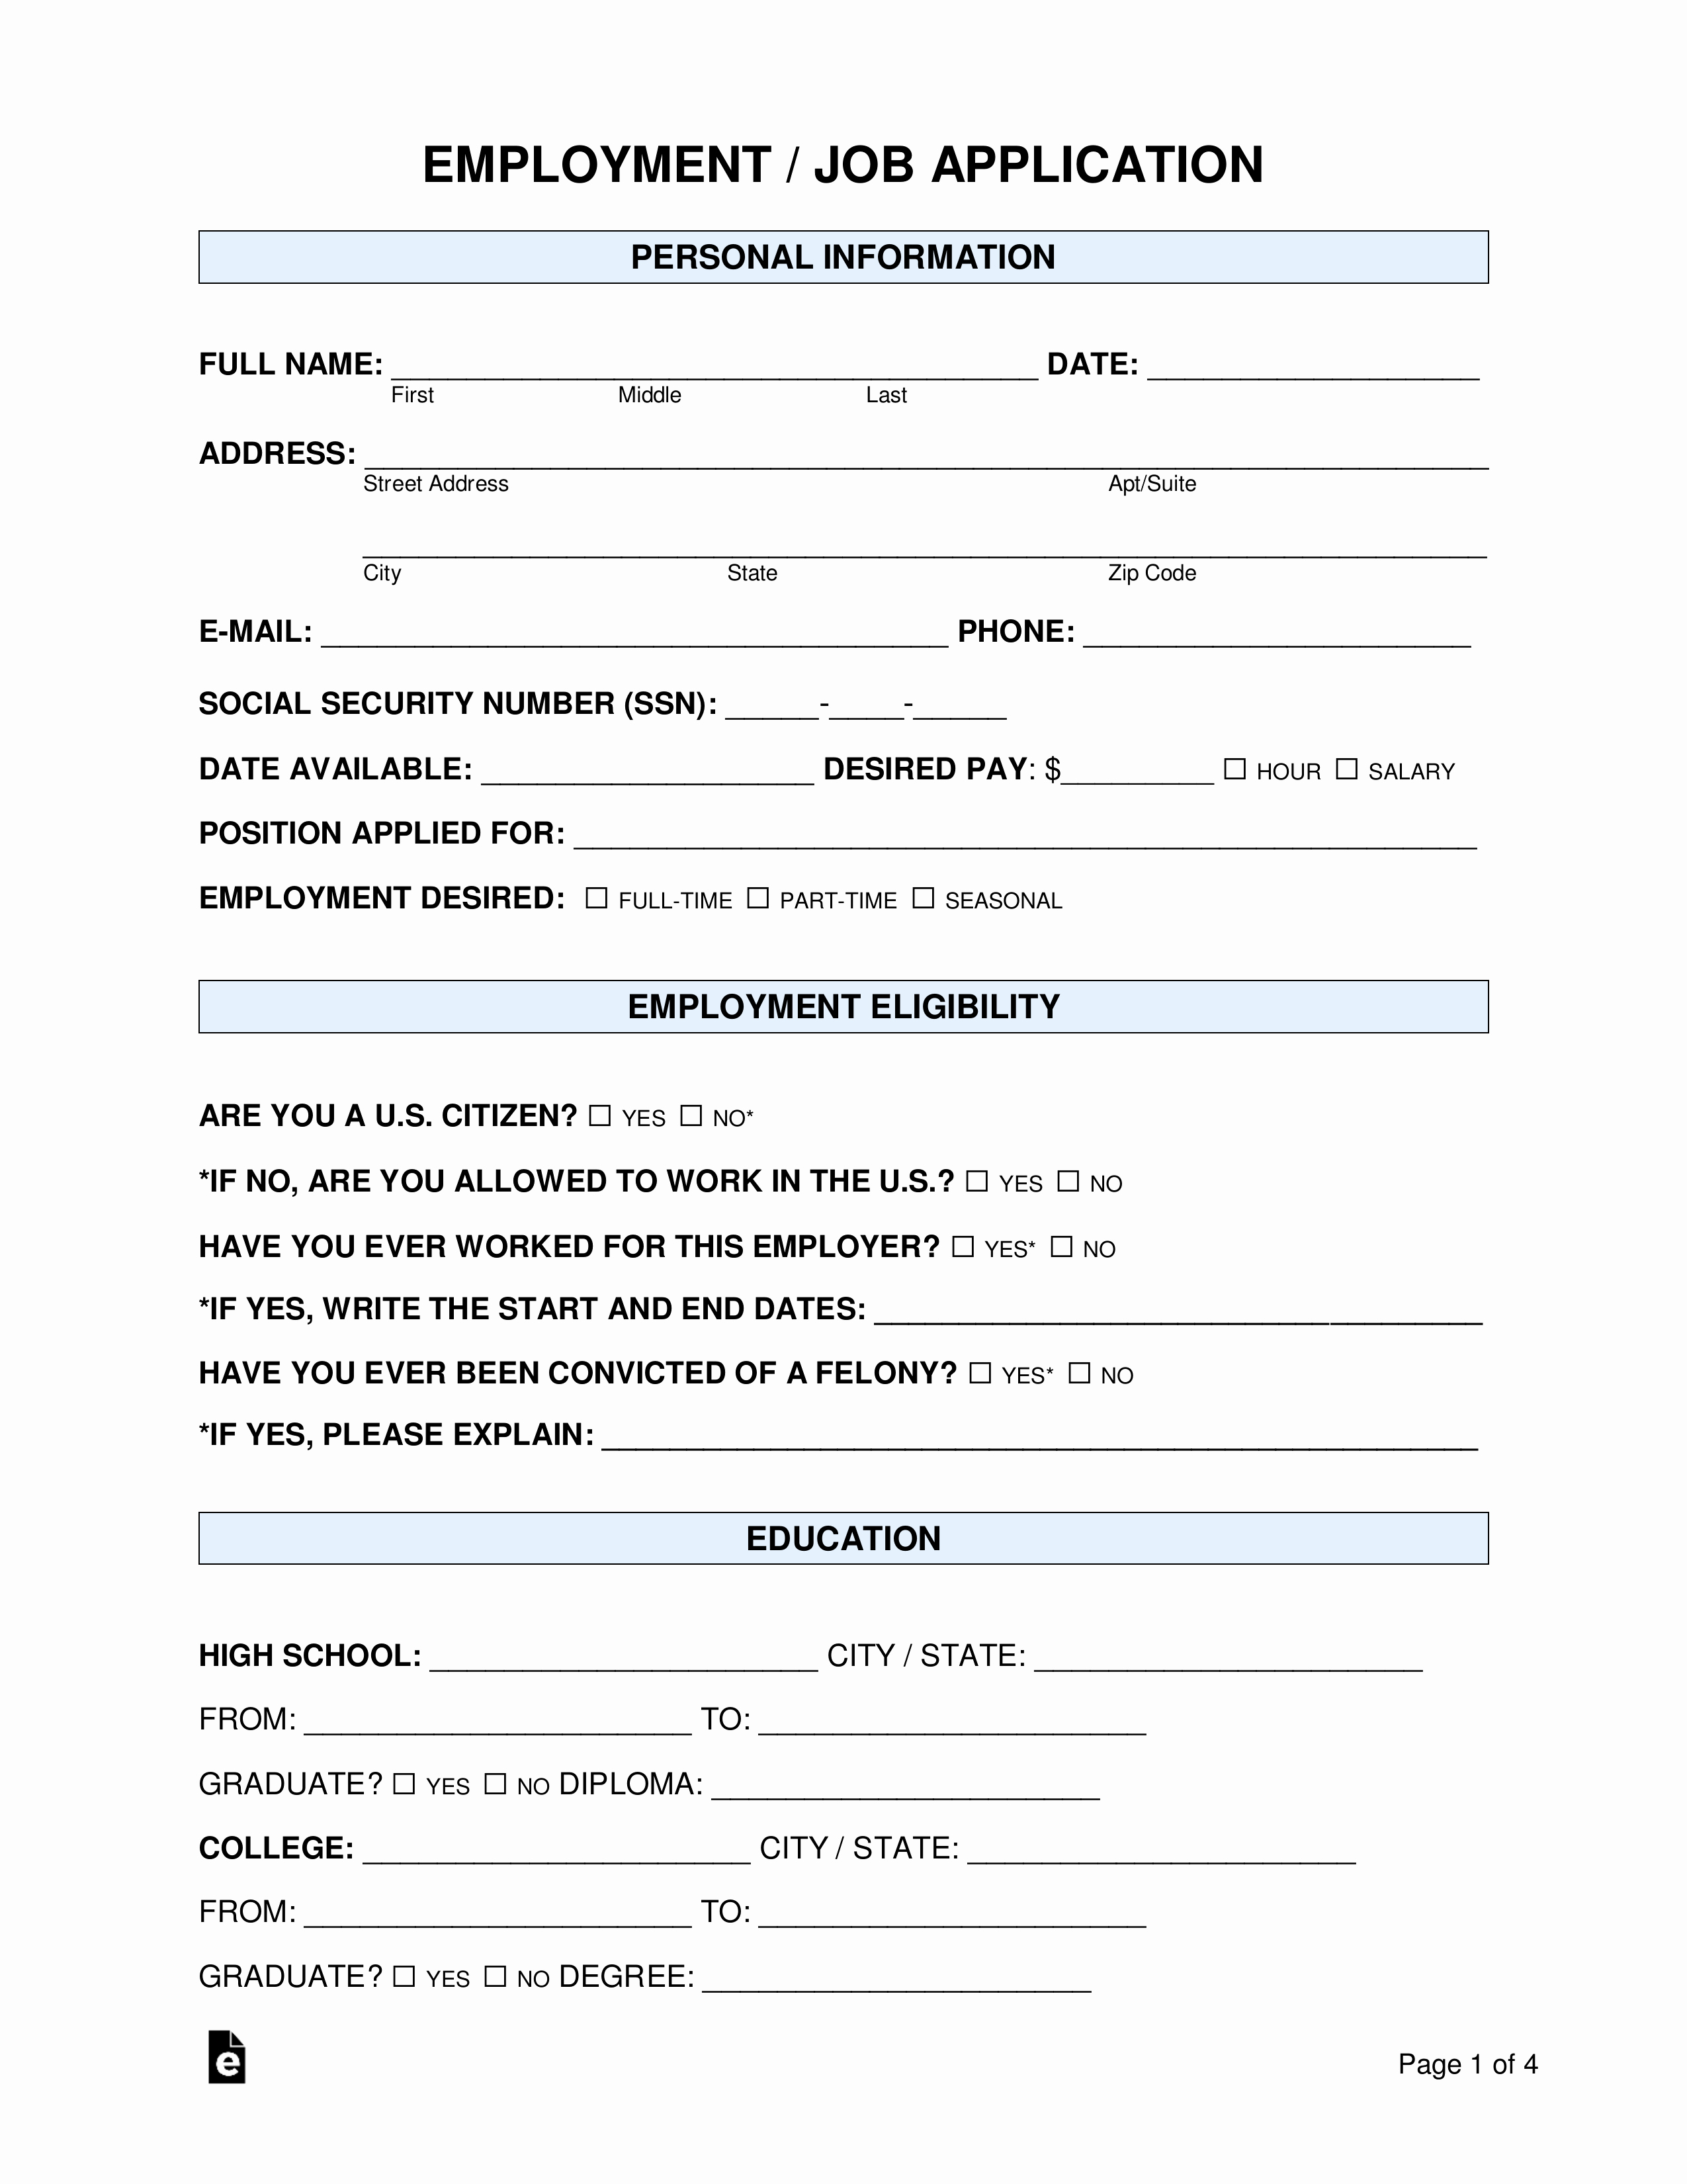 Jobs Application form Pdf Fresh Free Job Application form Standard Template Pdf